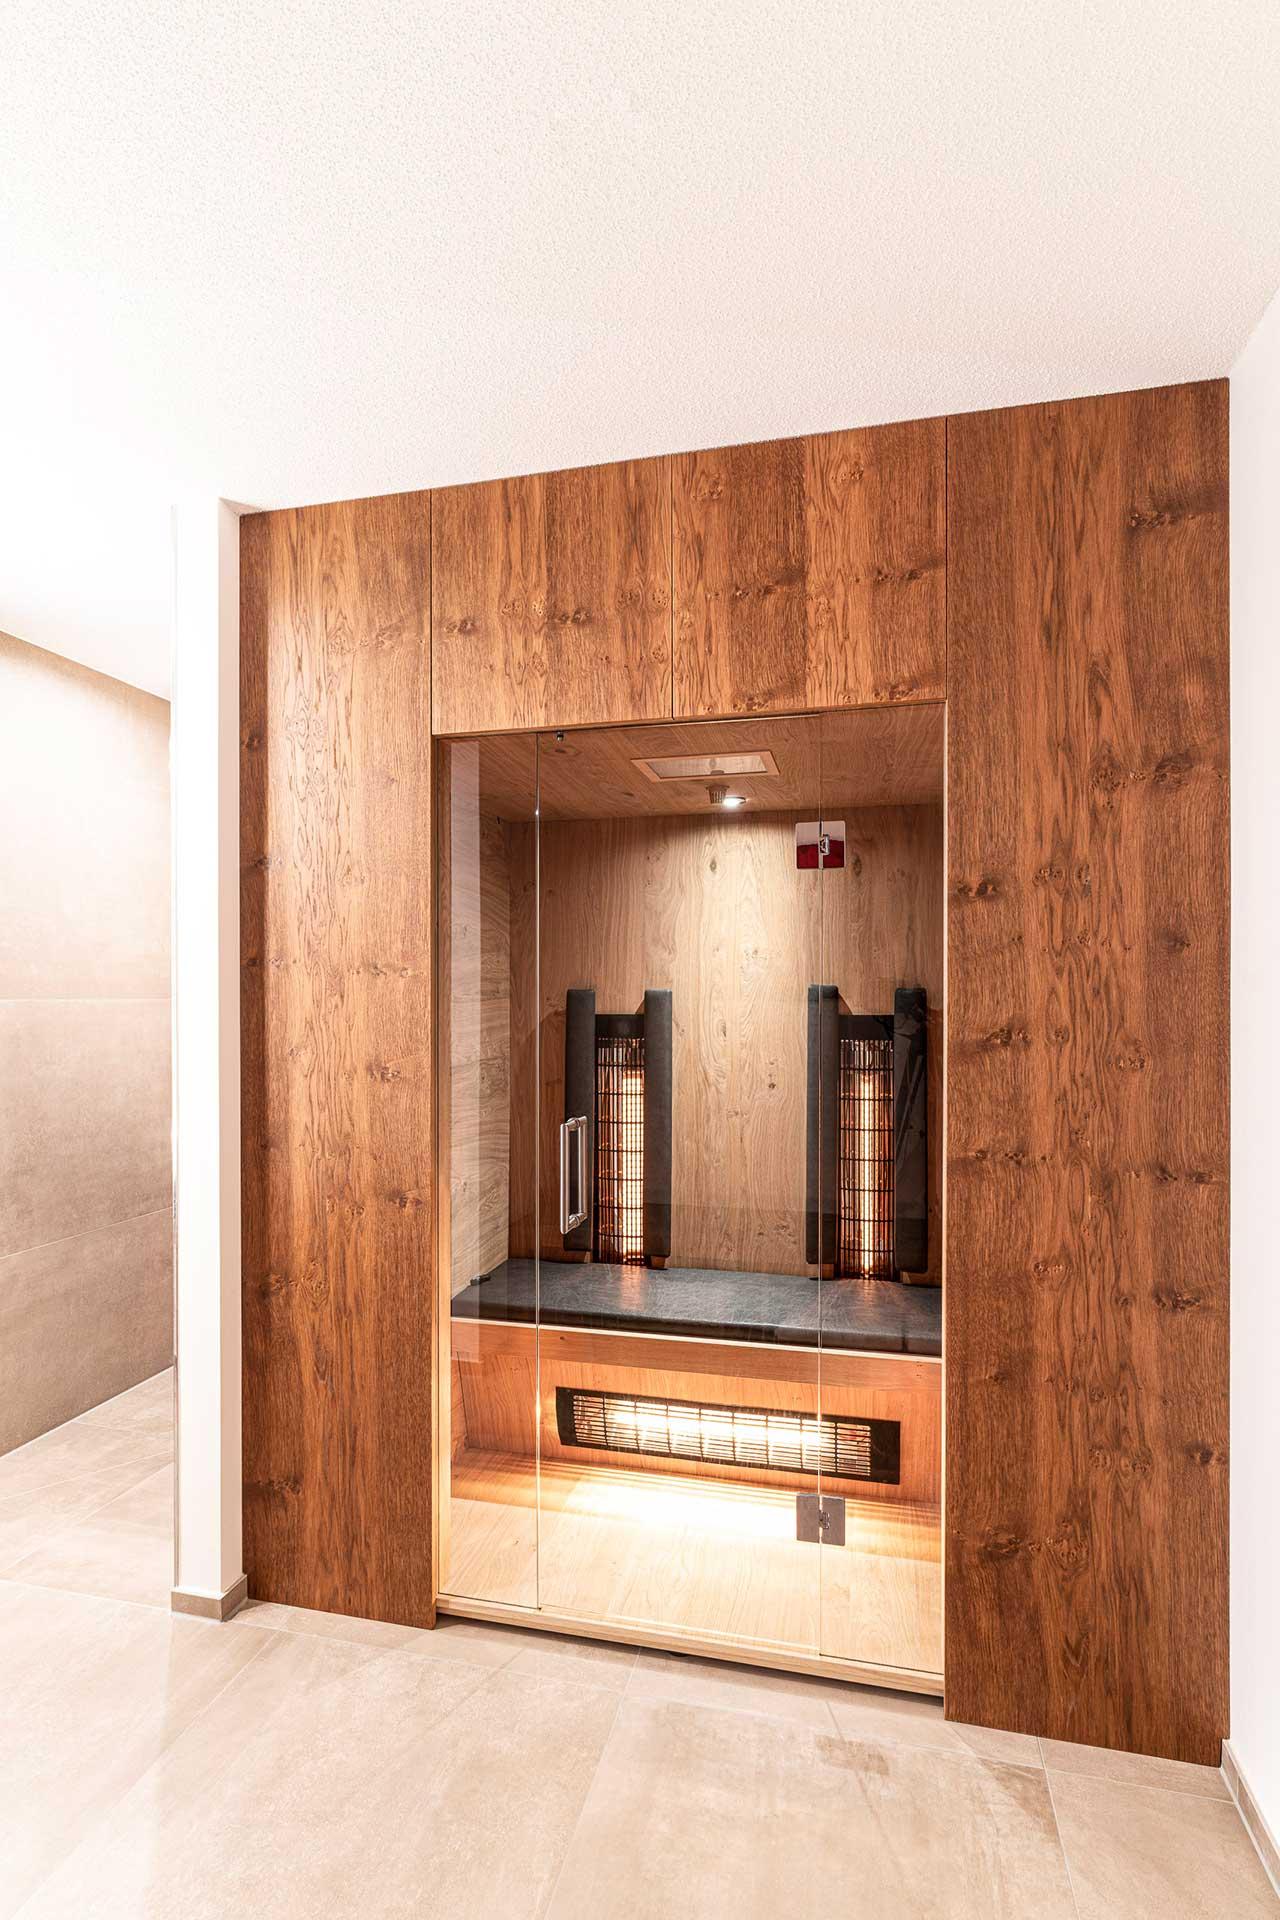 Holzverbau Infrarot Wärmekabine